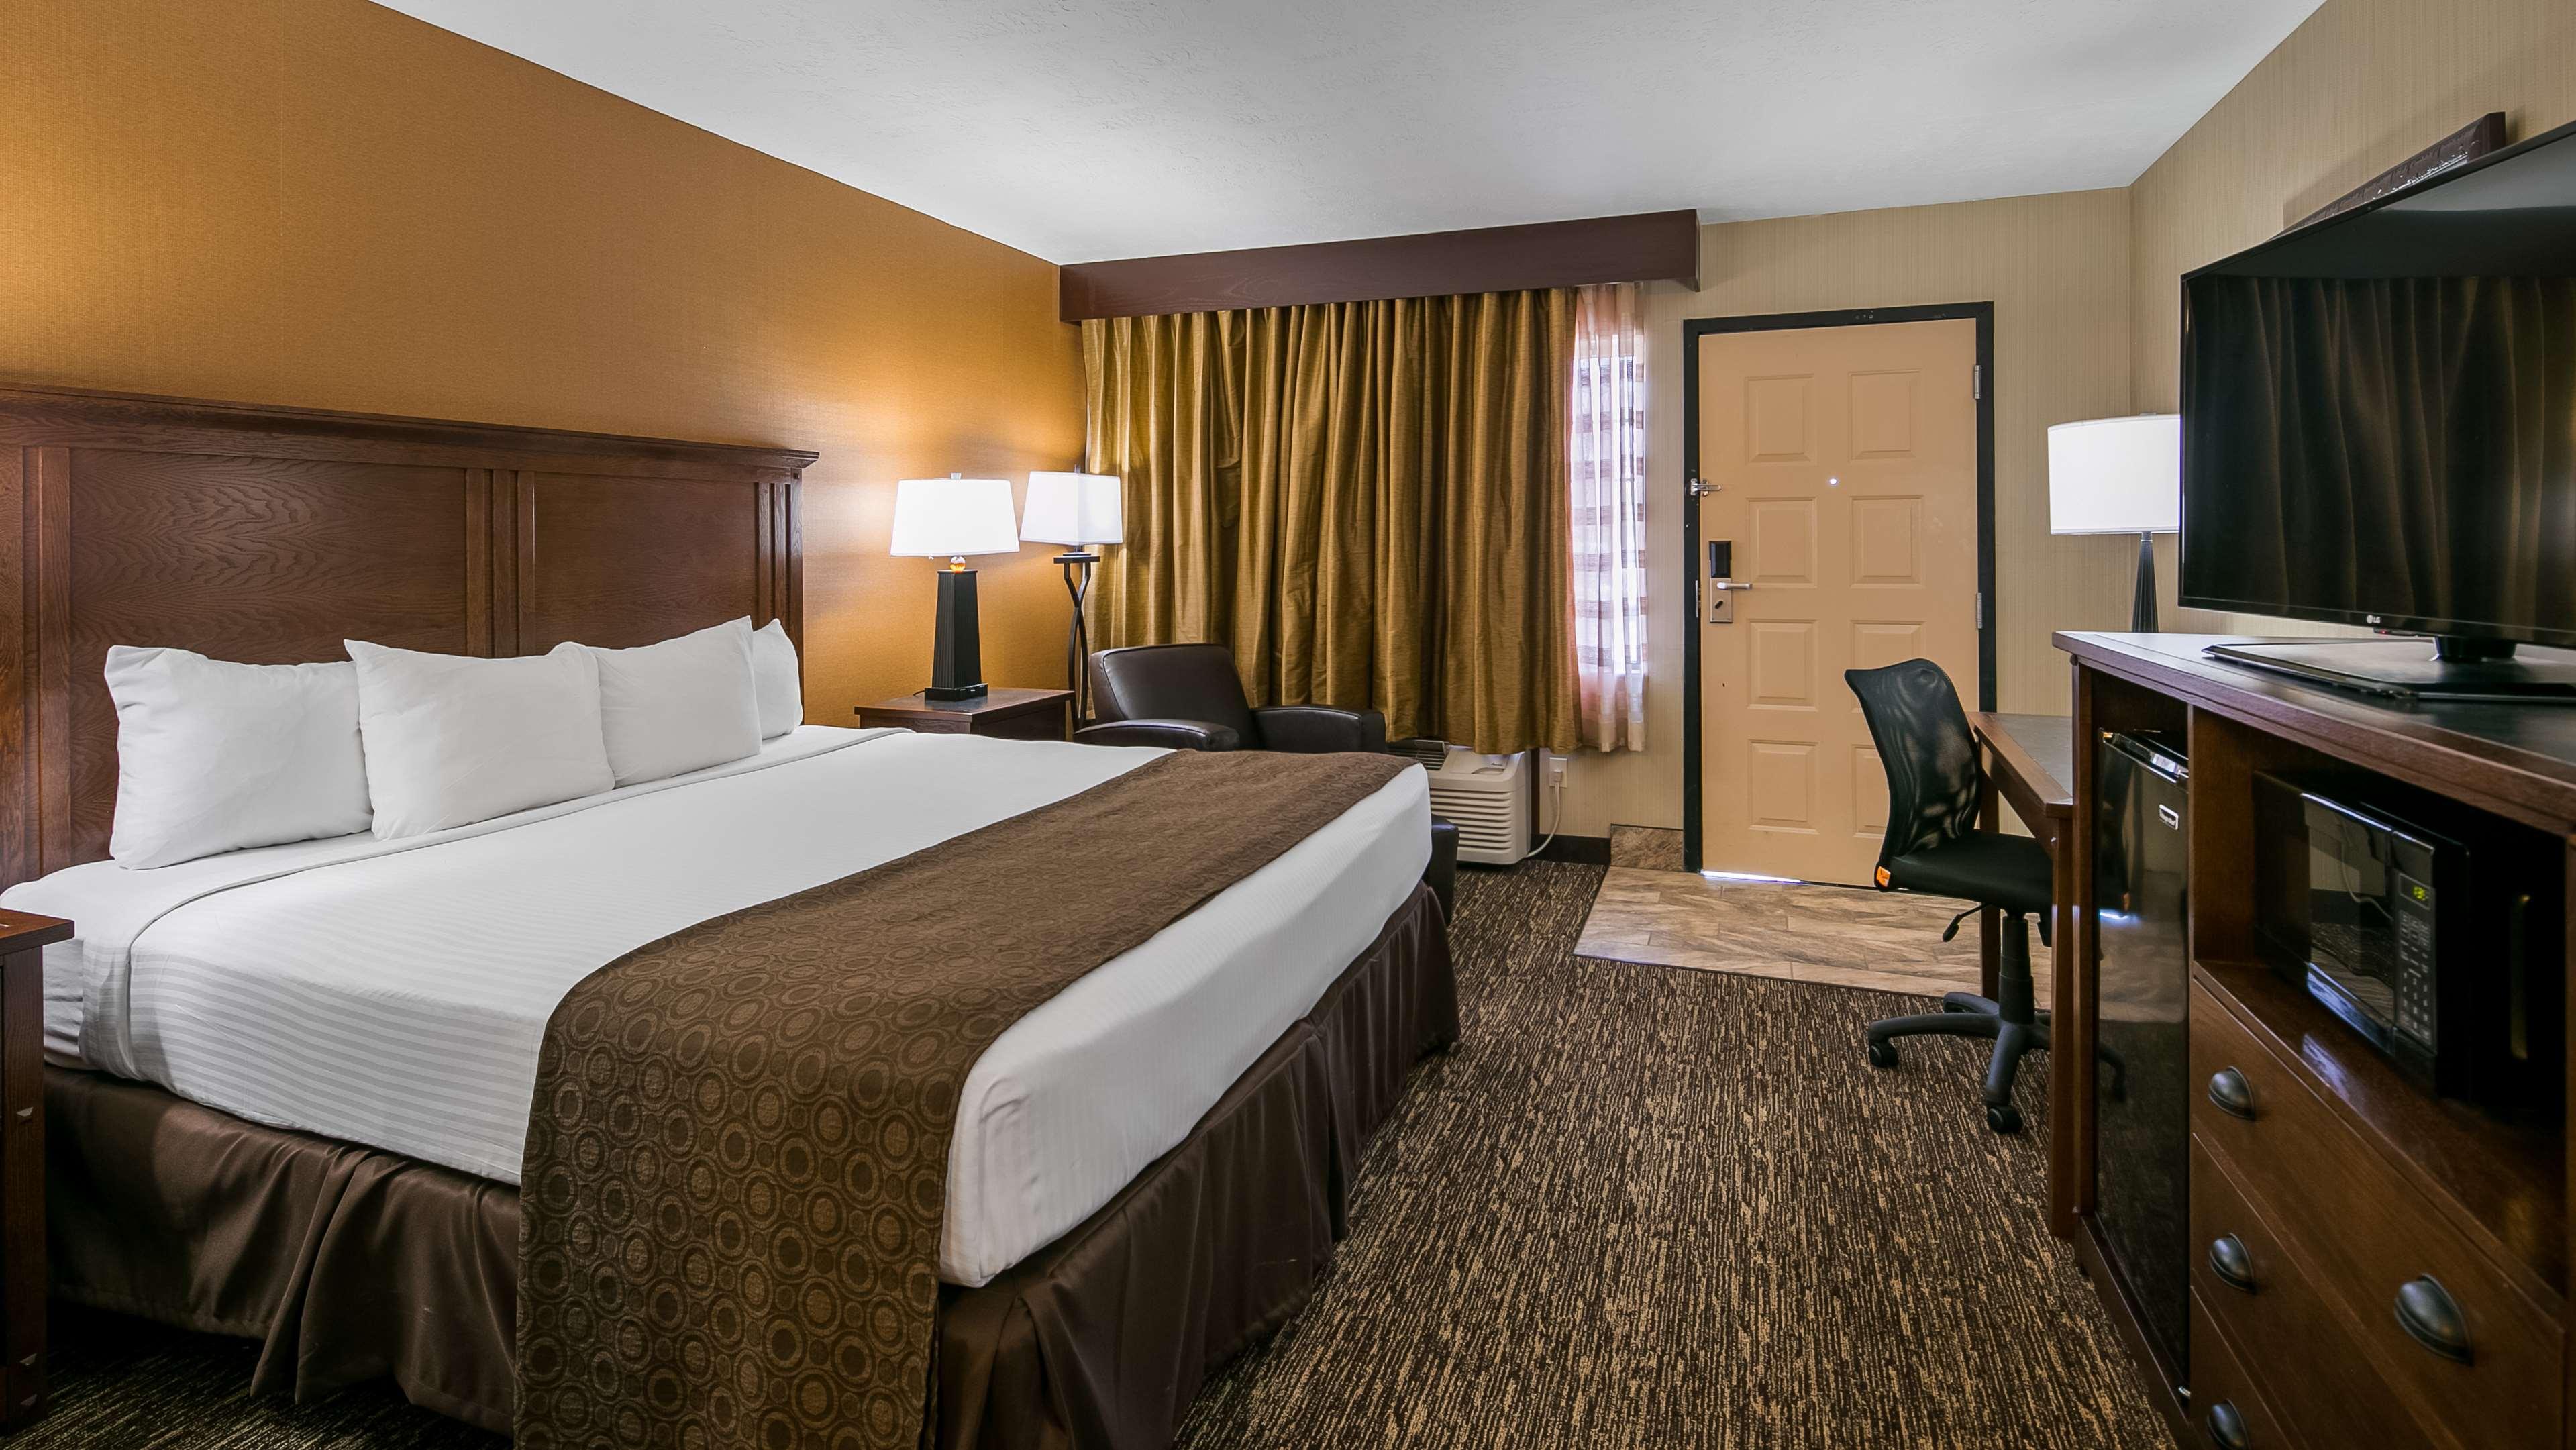 Best Western Ramkota Hotel image 9